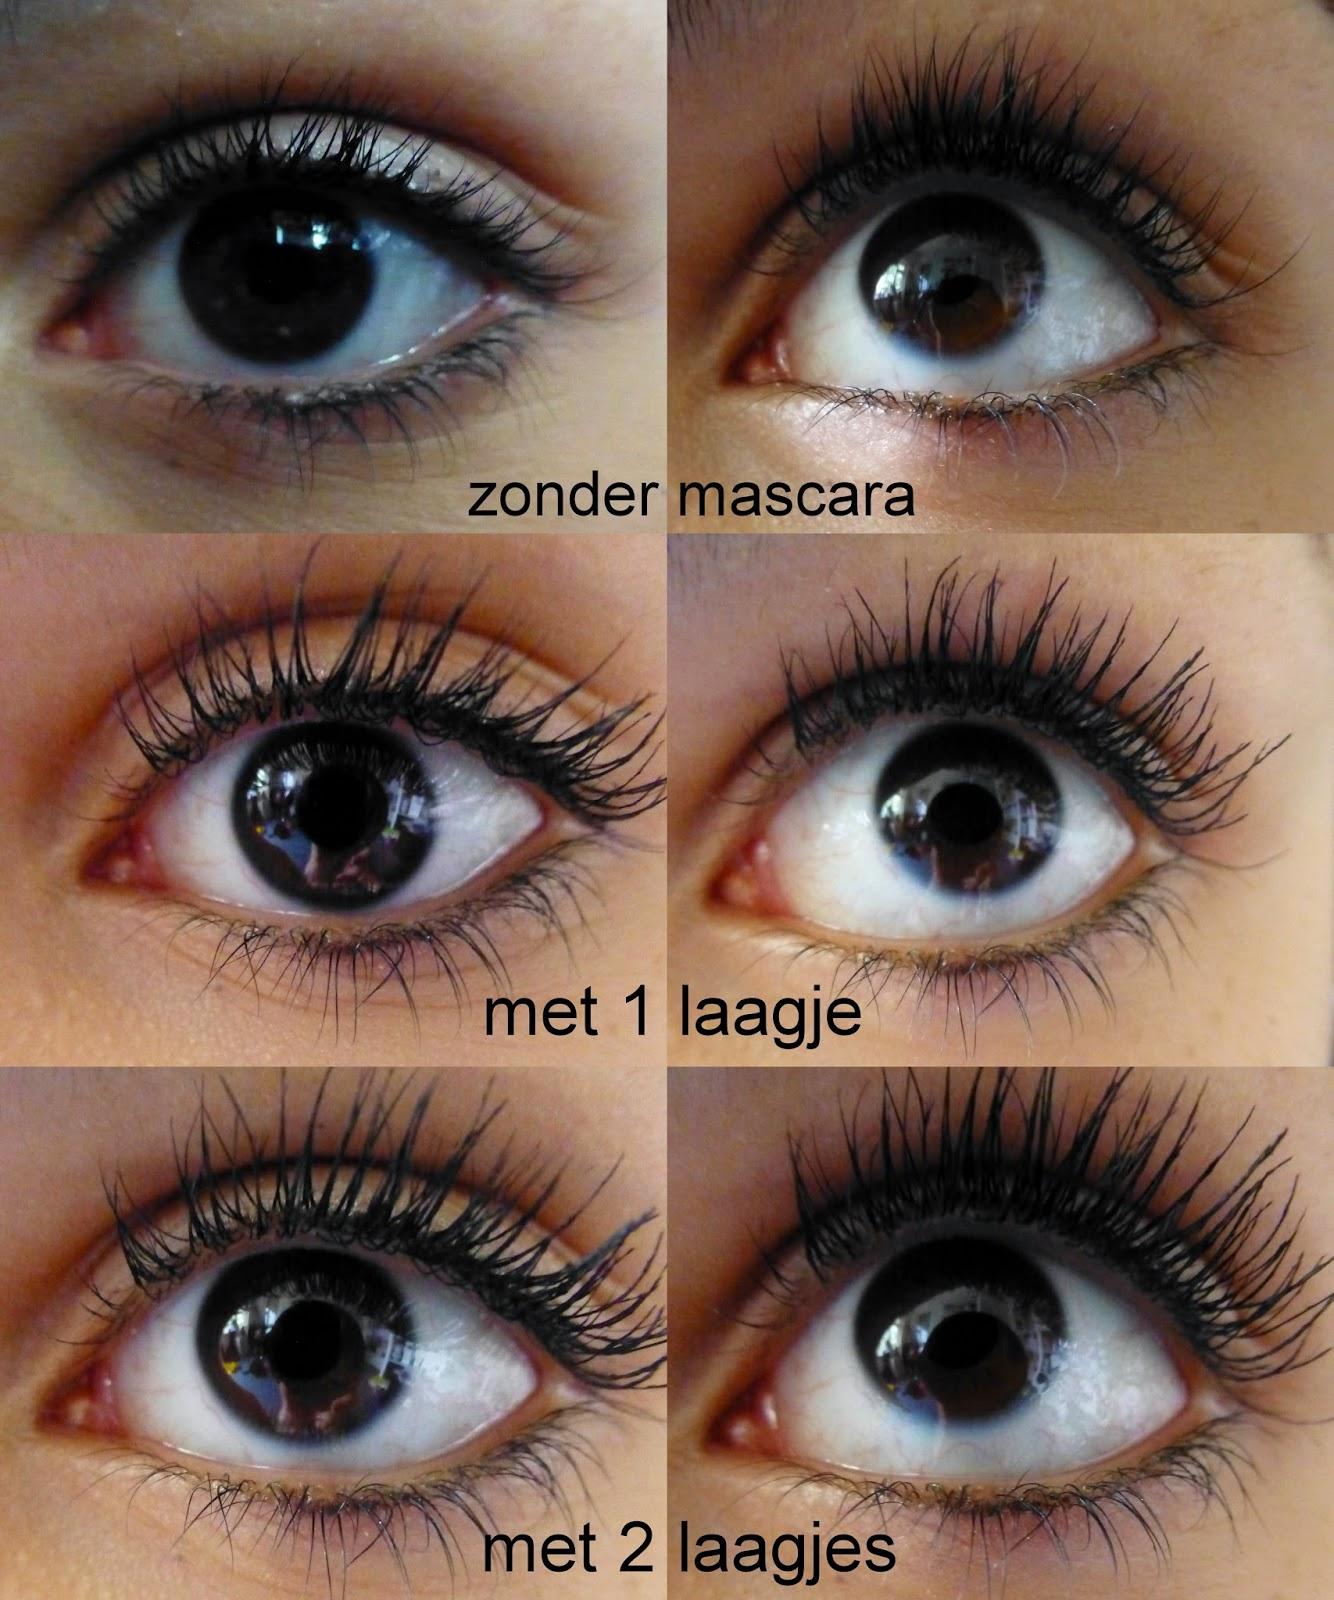 Mascara aanbrengen zonder klontjes